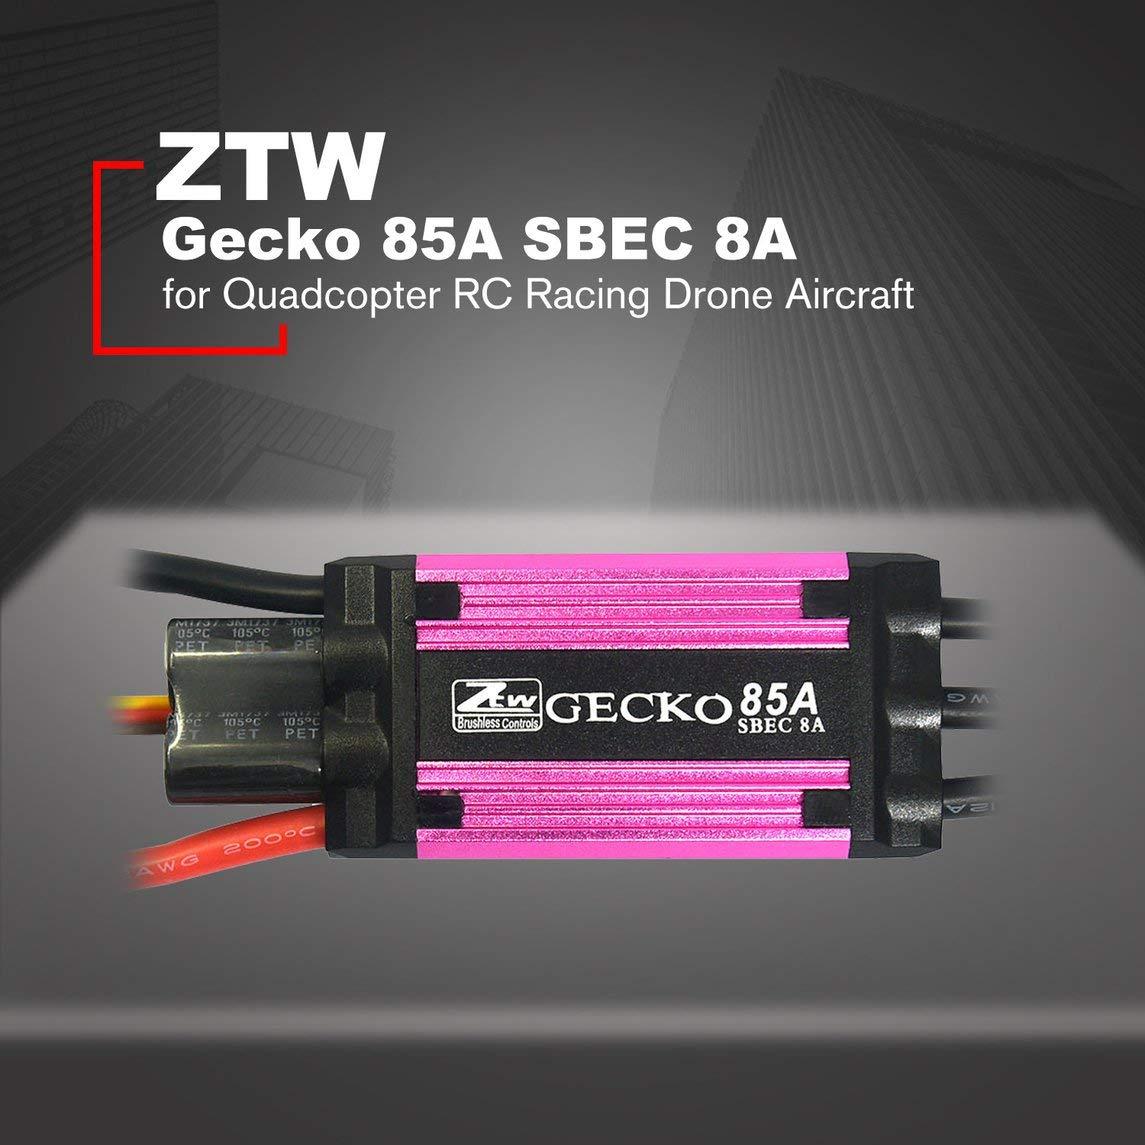 Footprintse ZTW Gecko Gecko Gecko 85A Brushless Regler mit 8A SBEC für Quadcopter RC Racing Drone-Farbe  Pink & Schwarz 915239